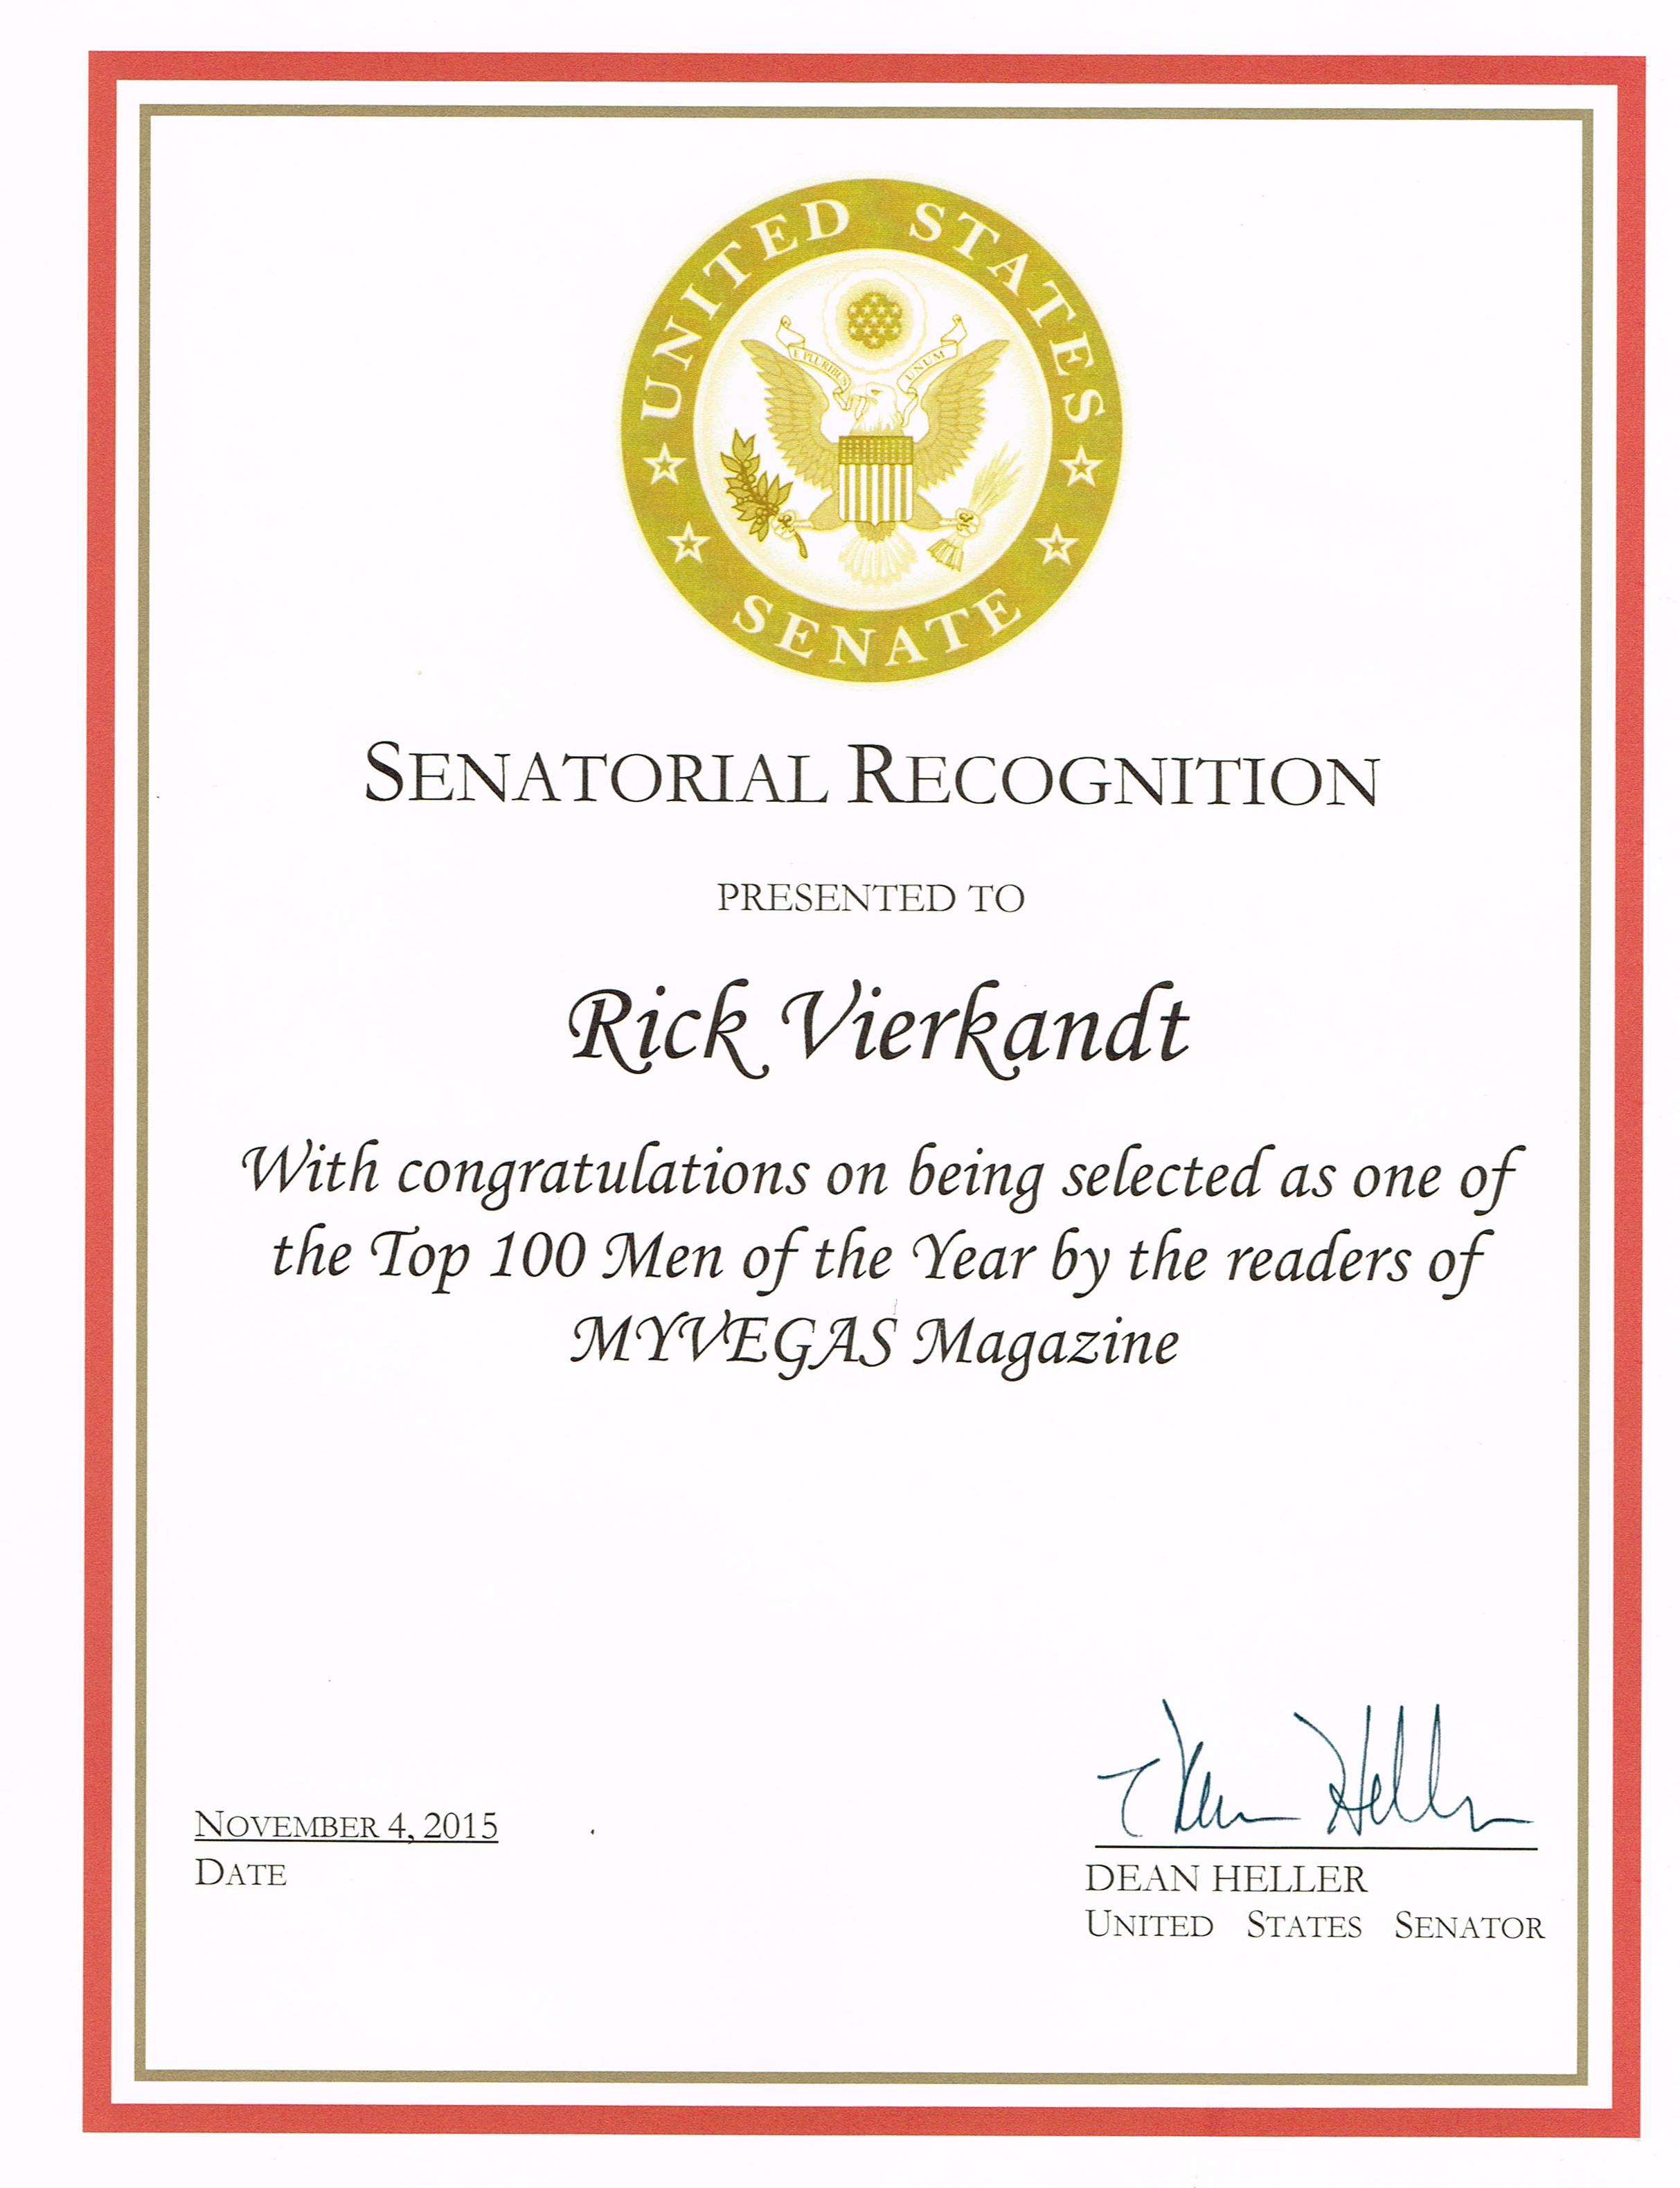 Senatorial Recognition- Dean Heller